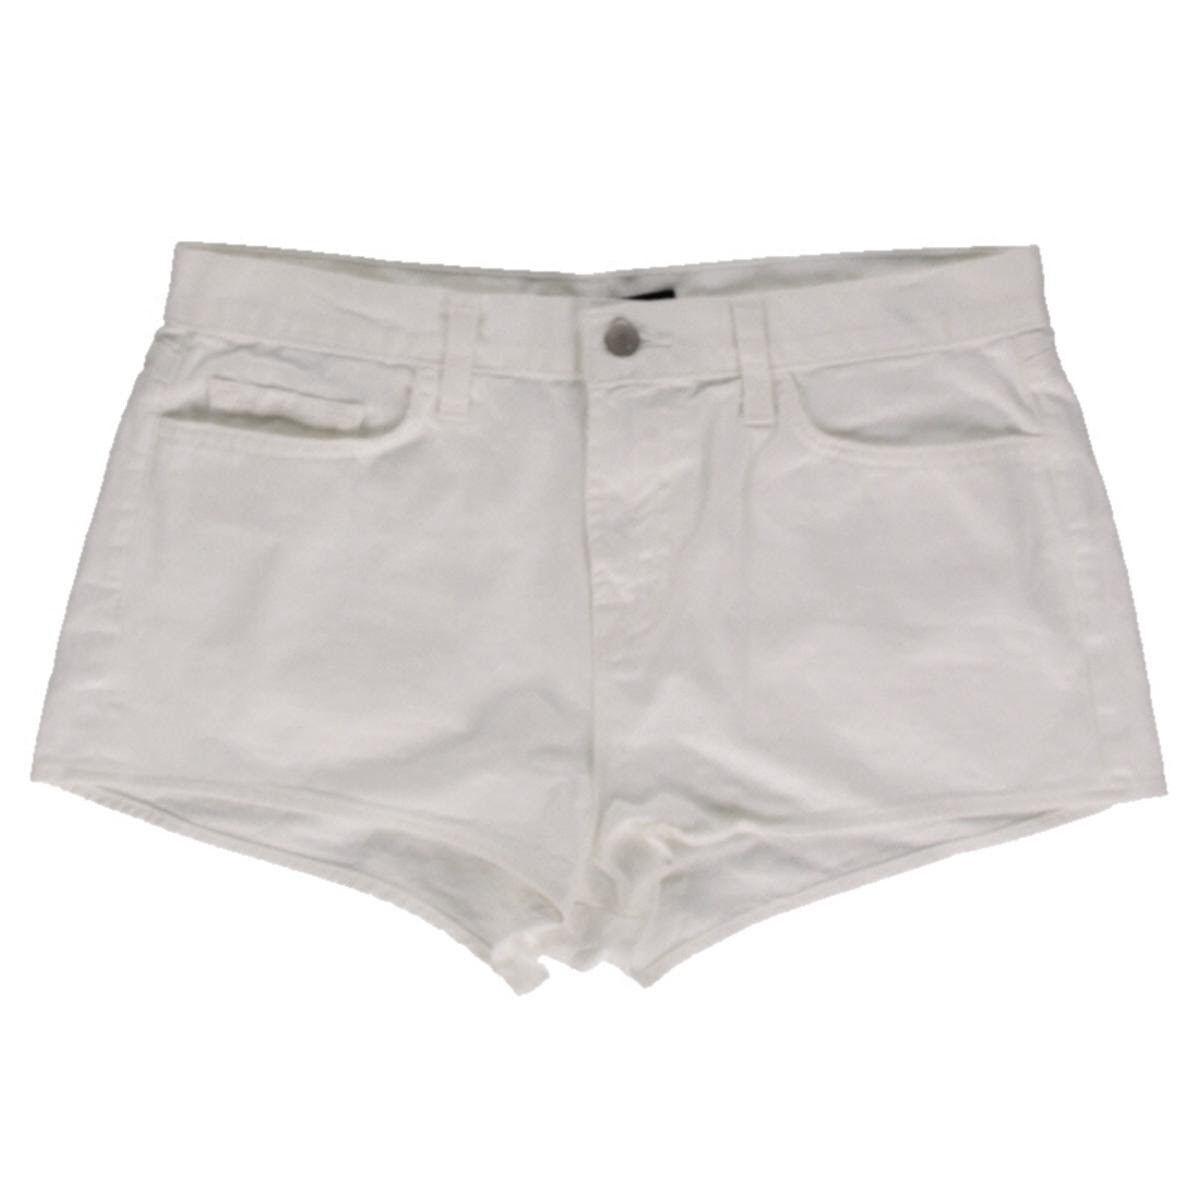 J Brand Shorts Hot Pants High-Rise Cuffed White Denim AU10 W28 US6 NEW Womens